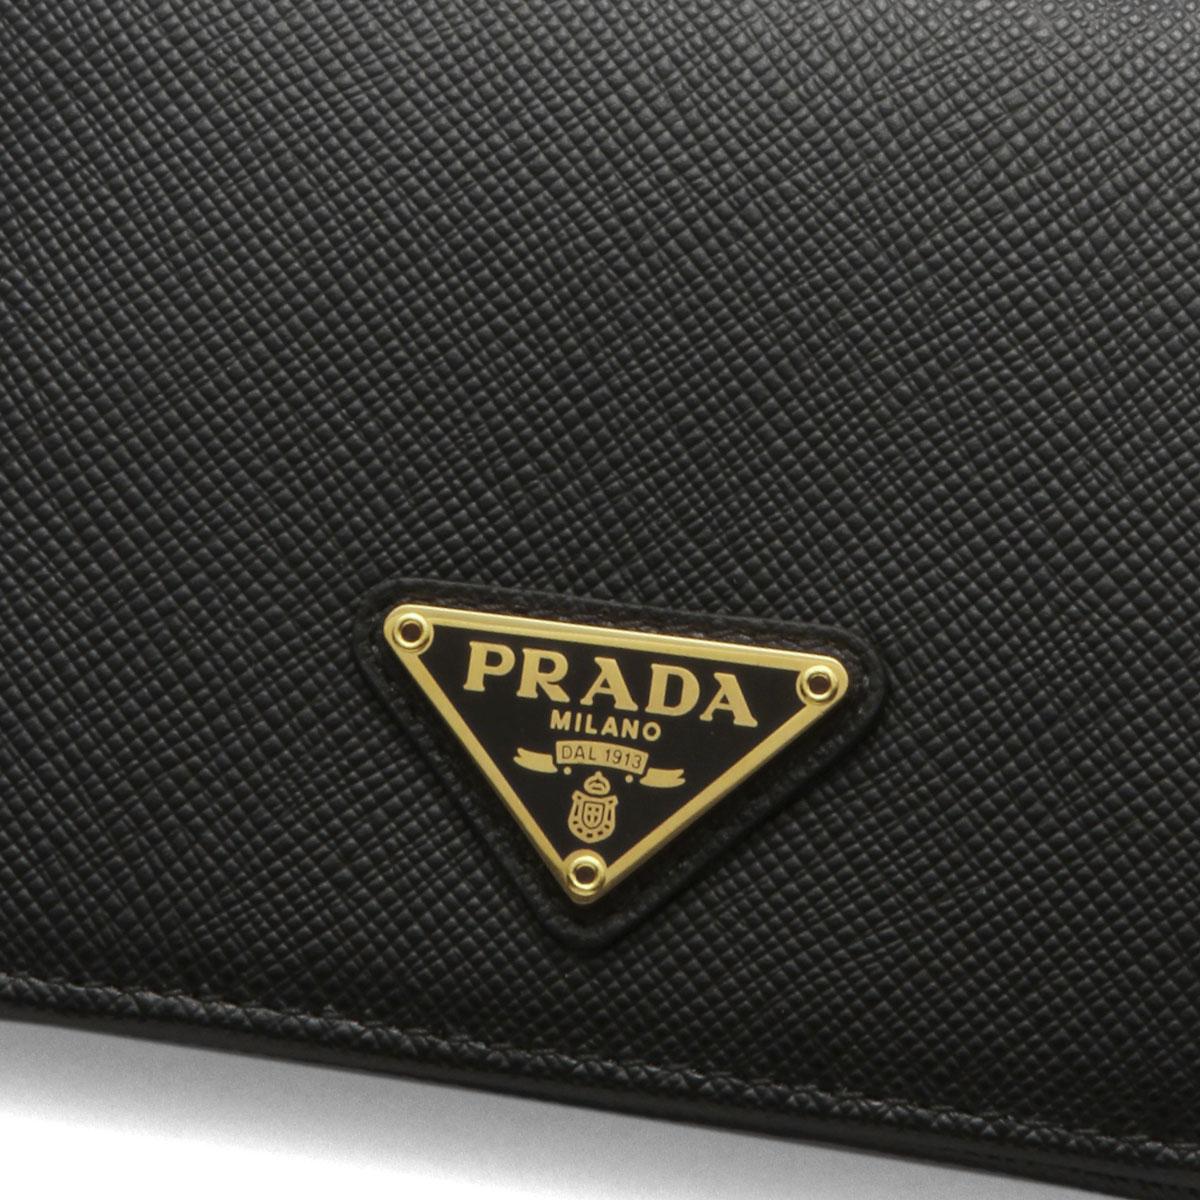 59c8251a223c ... Prada PRADA wallet Lady's 1MV204 QHH F0002 folio wallet SAFFIANO  TRIANGOLO NERO black ...